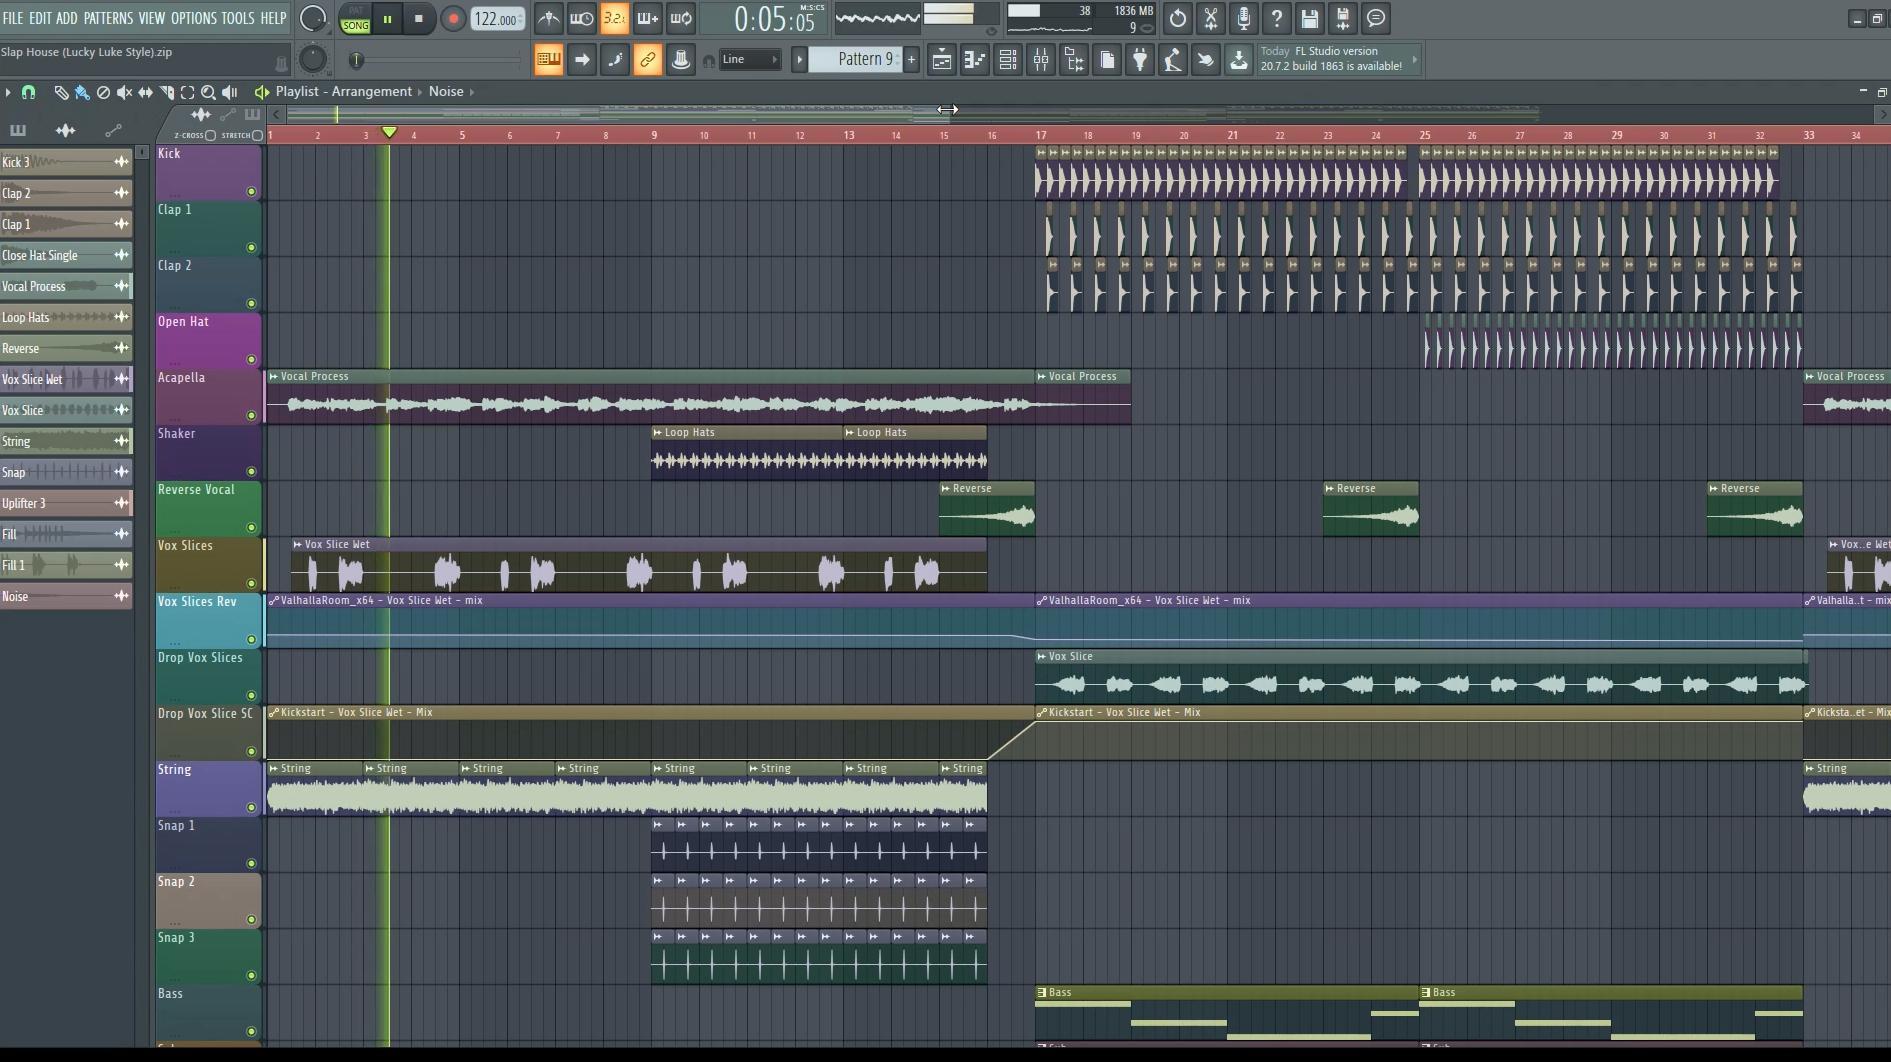 Slap House Ableton & FL Studio Template Vol. 2 By Soundlabs - fl studio screenshot